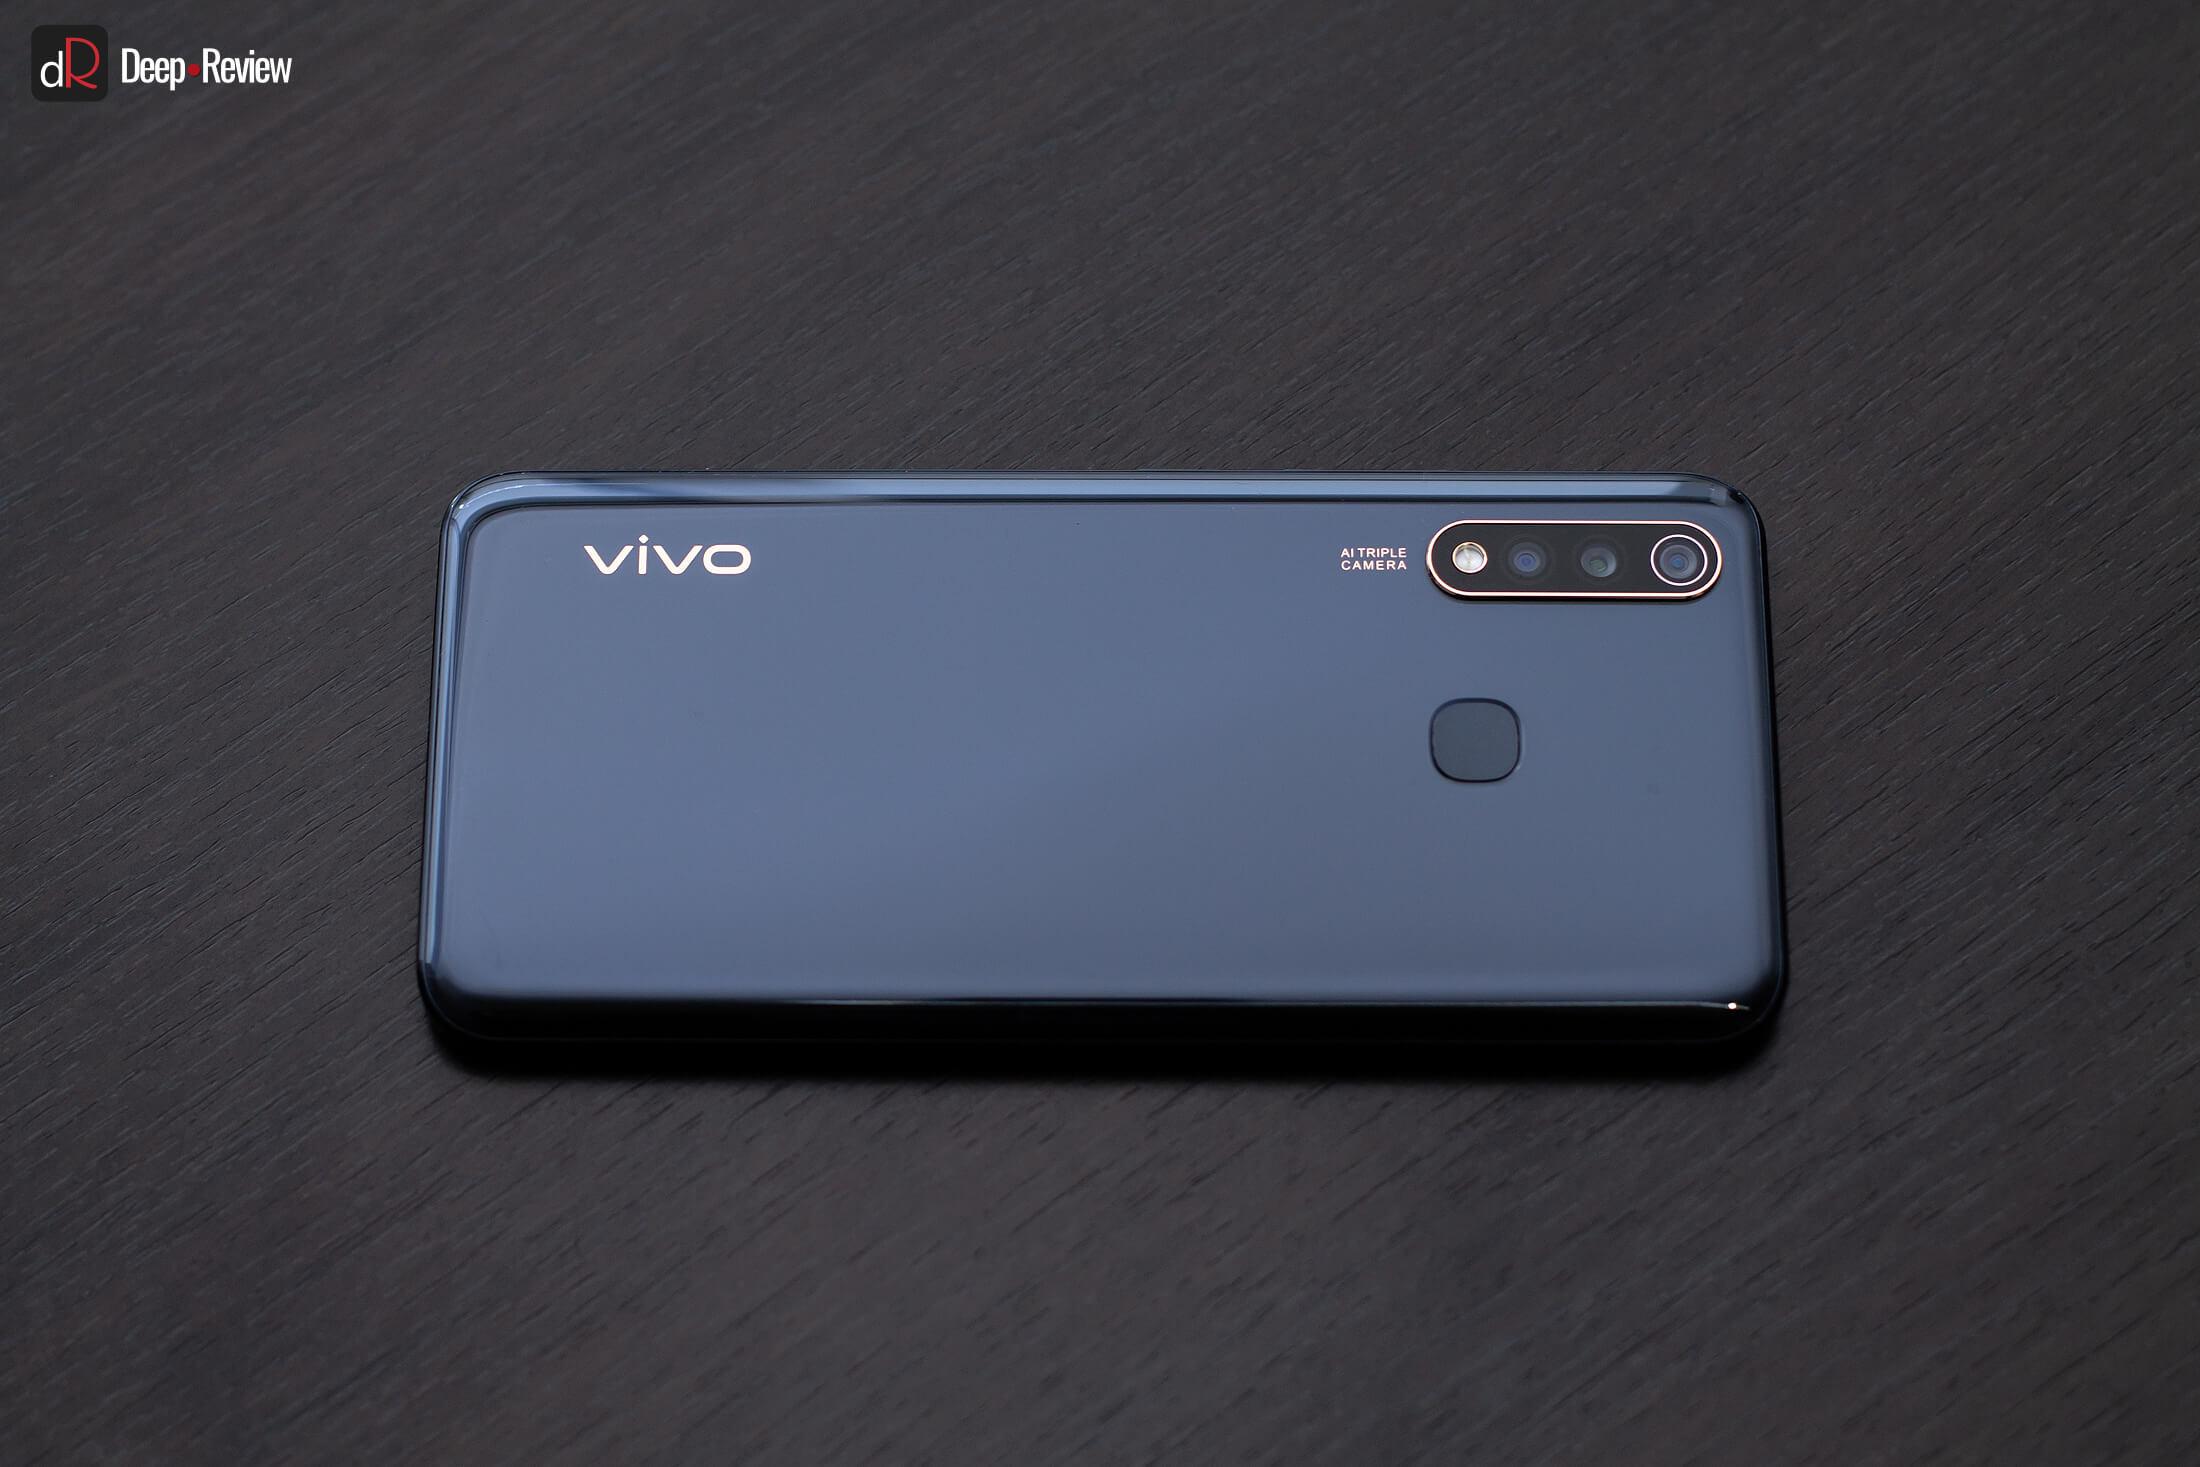 смартфон vivo y19 обзор